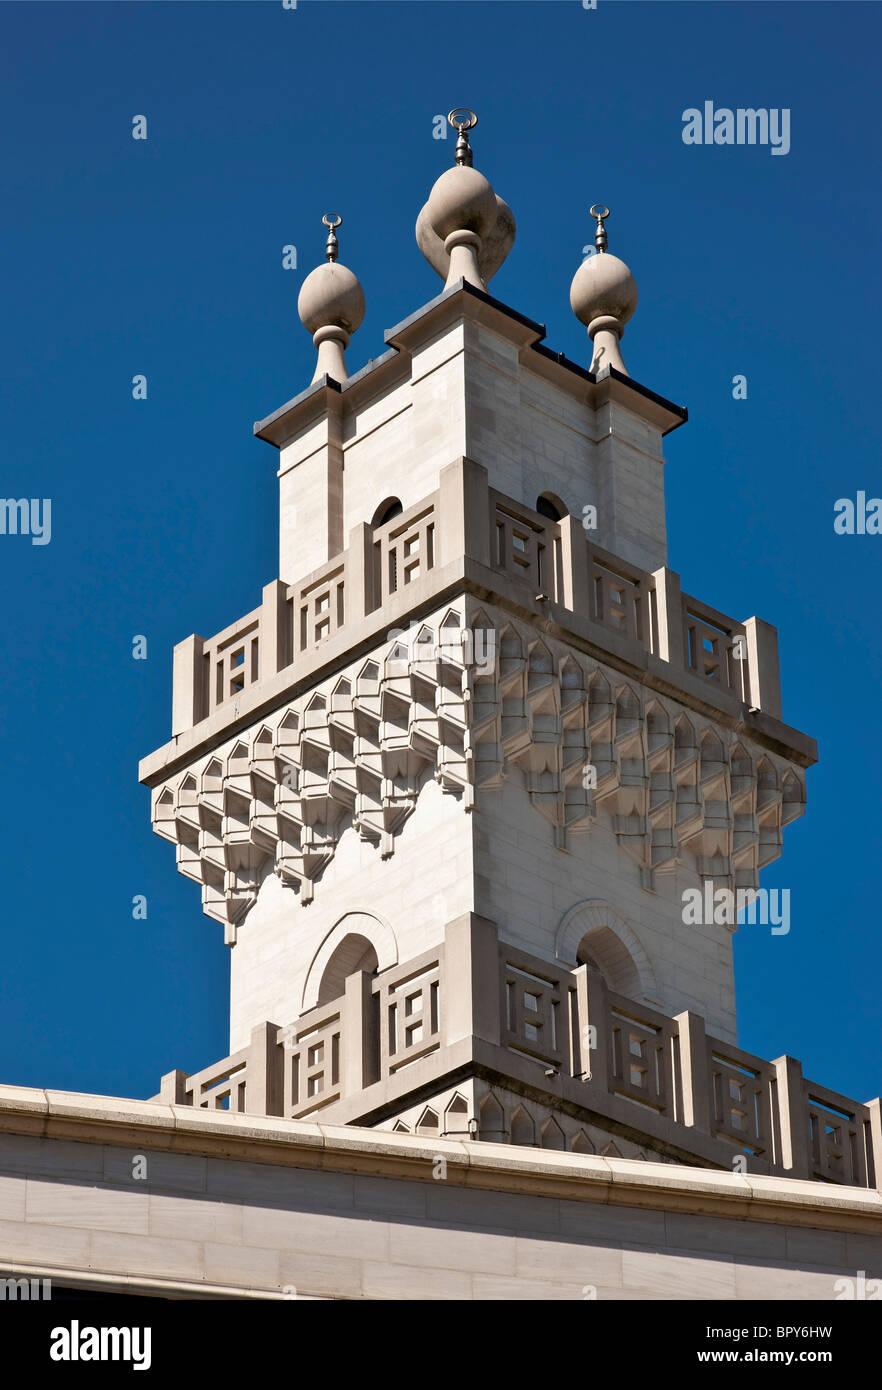 Islamic University Stock Photos & Islamic University Stock